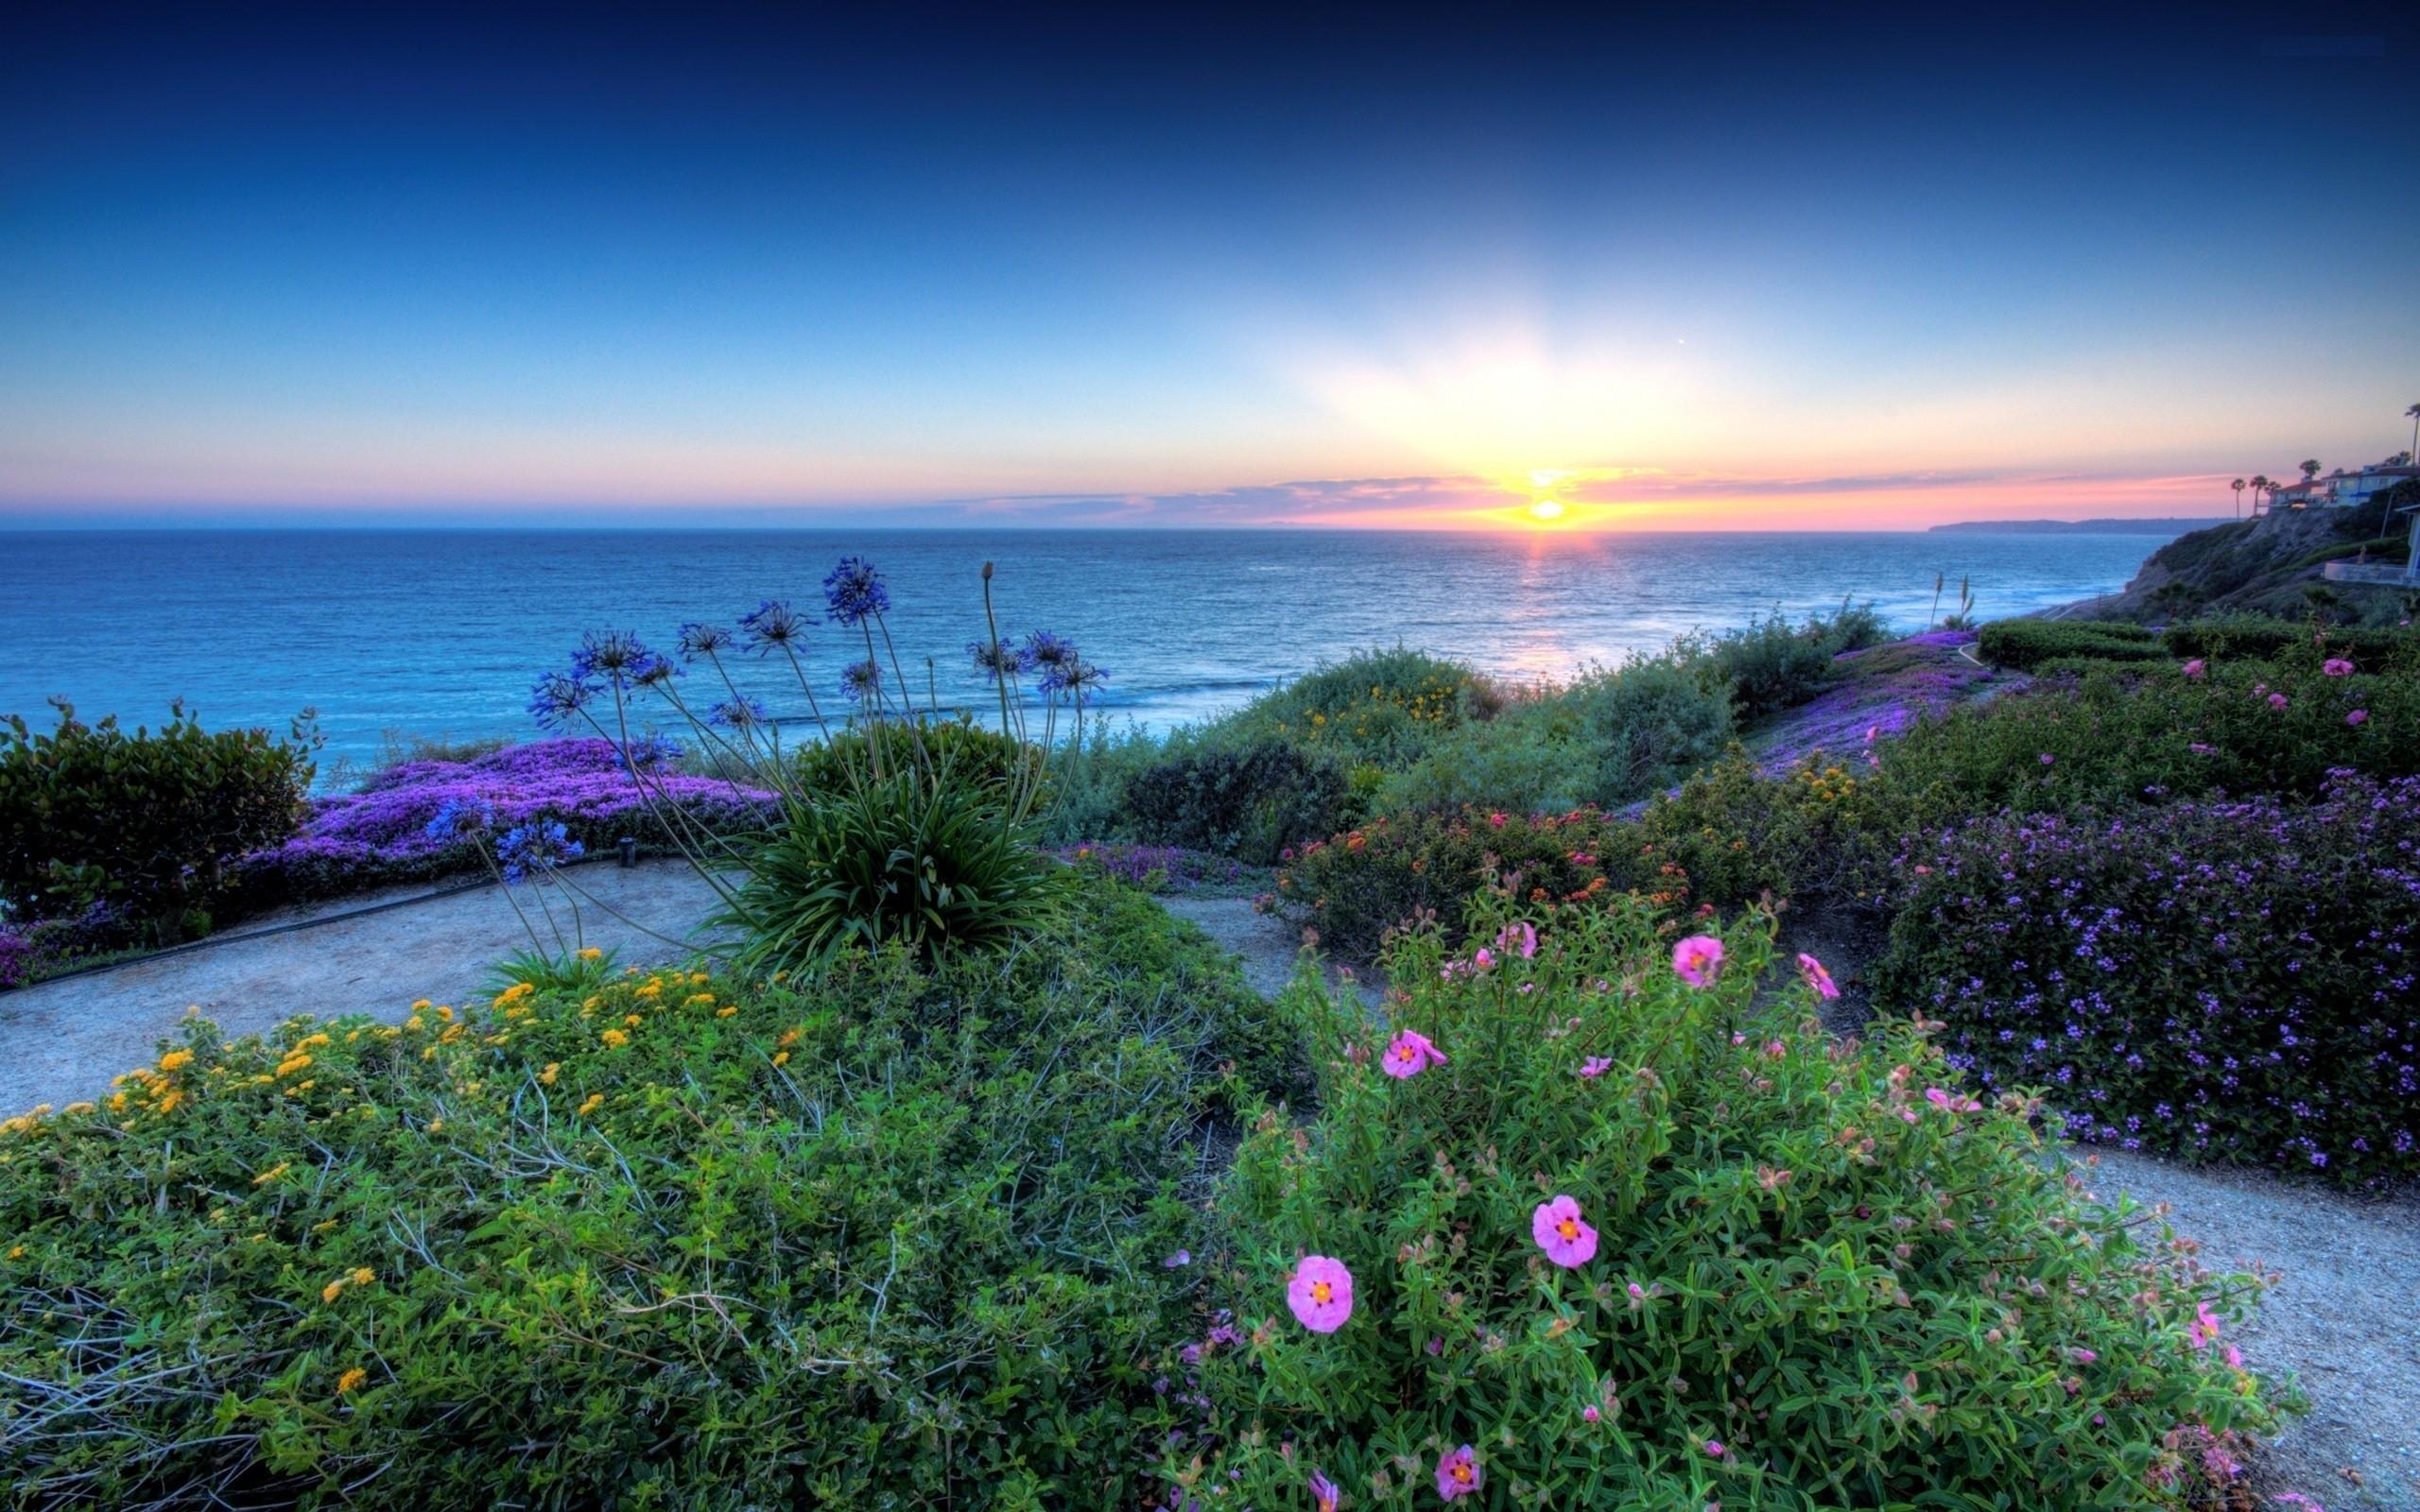 Flowers Beautiful Nature Blue Beach Sunrise Ocean Sky Sunshine Sunset  Wallpaper Tablet